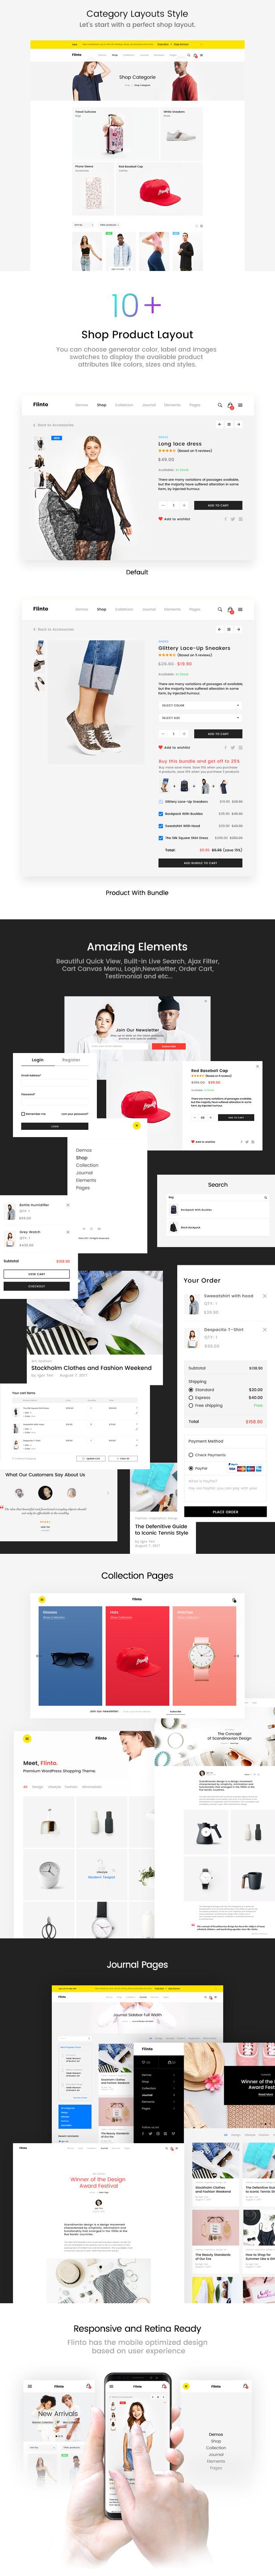 Flinto – Modern and Minimal eCommerce WordPress Theme - 4